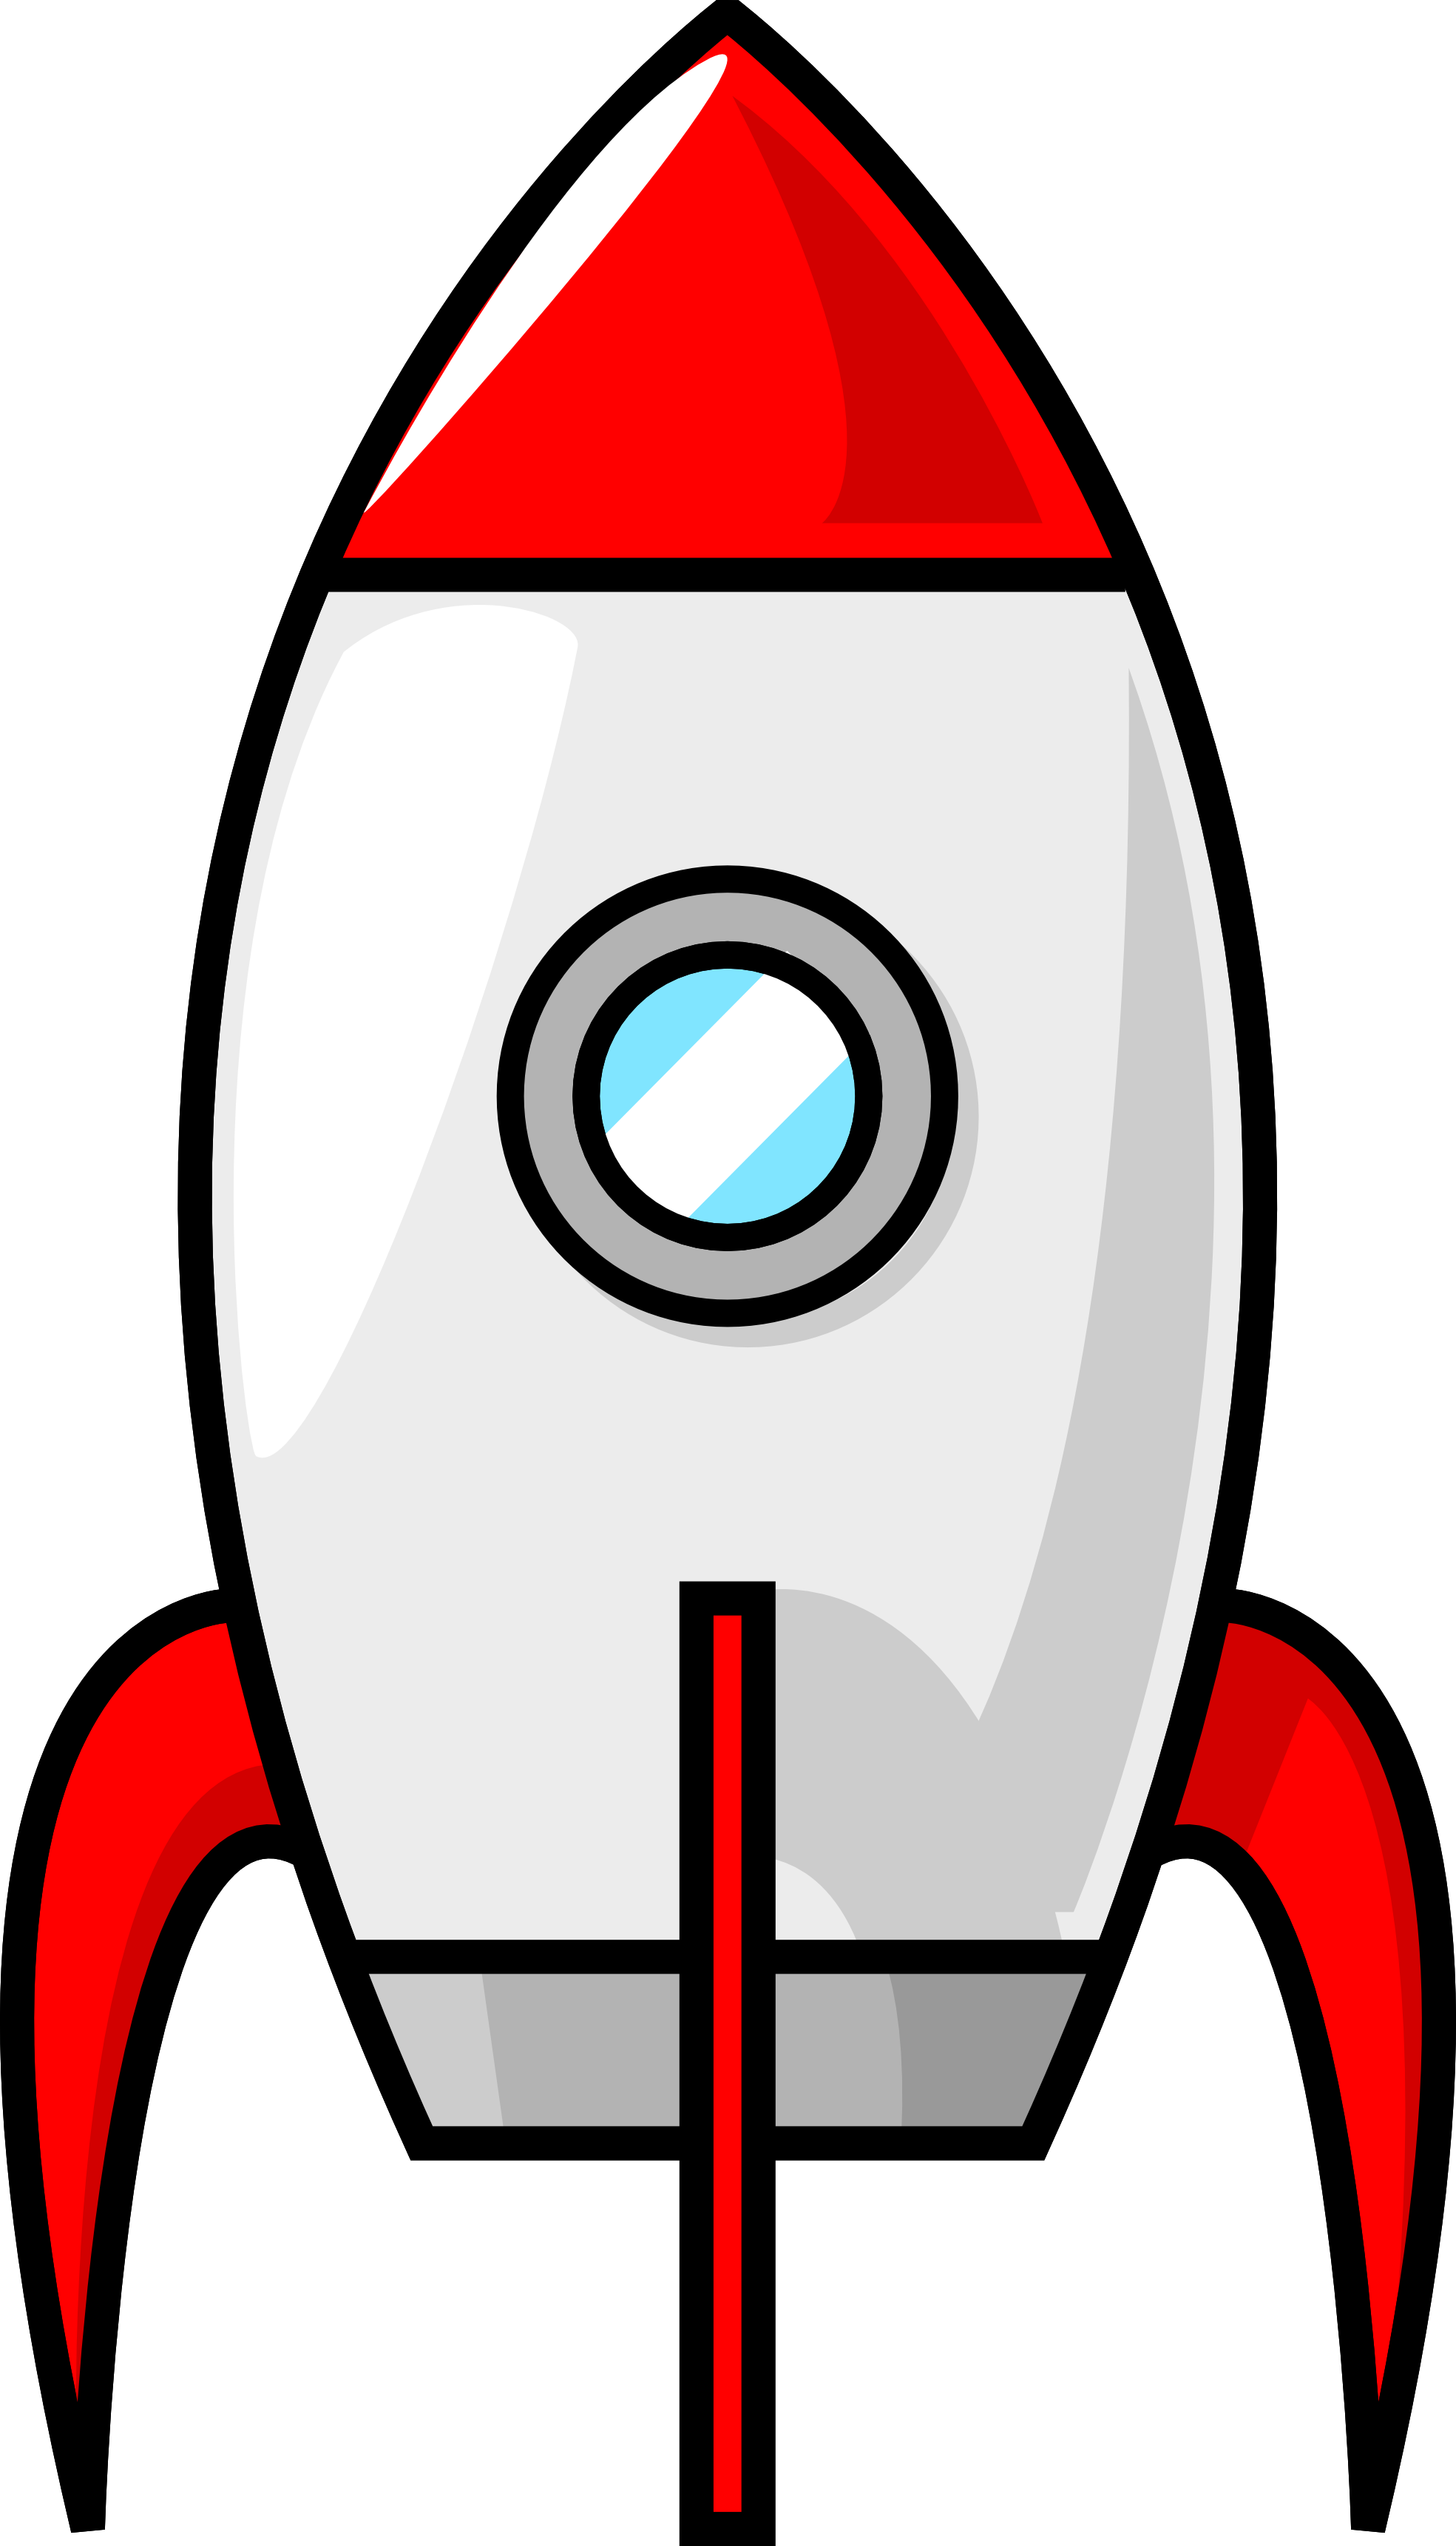 Ufo clipart spaceship. Rocket clip art pinterest